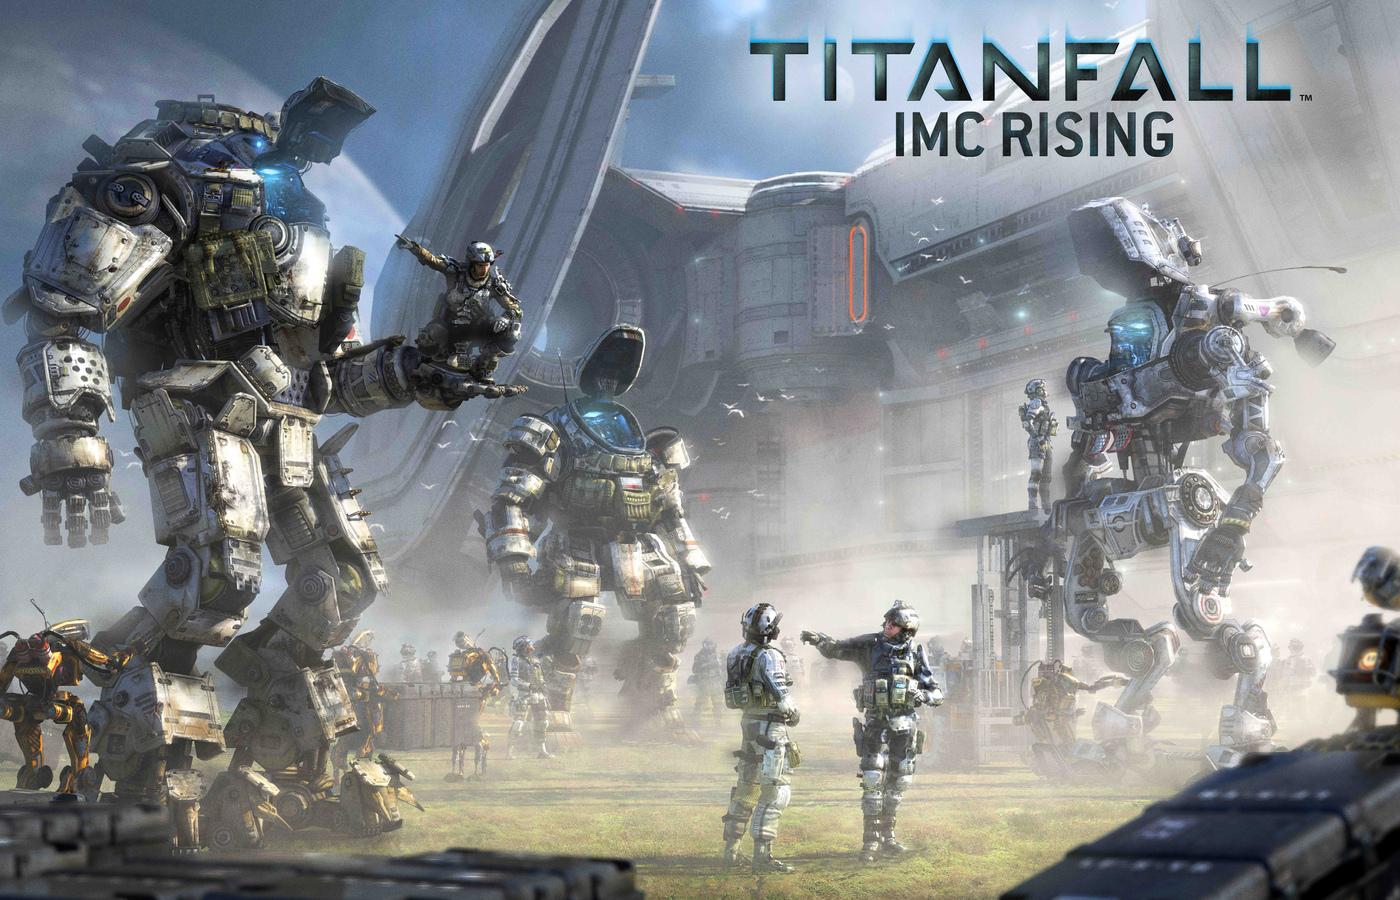 titanicfall-imc-rising.jpg